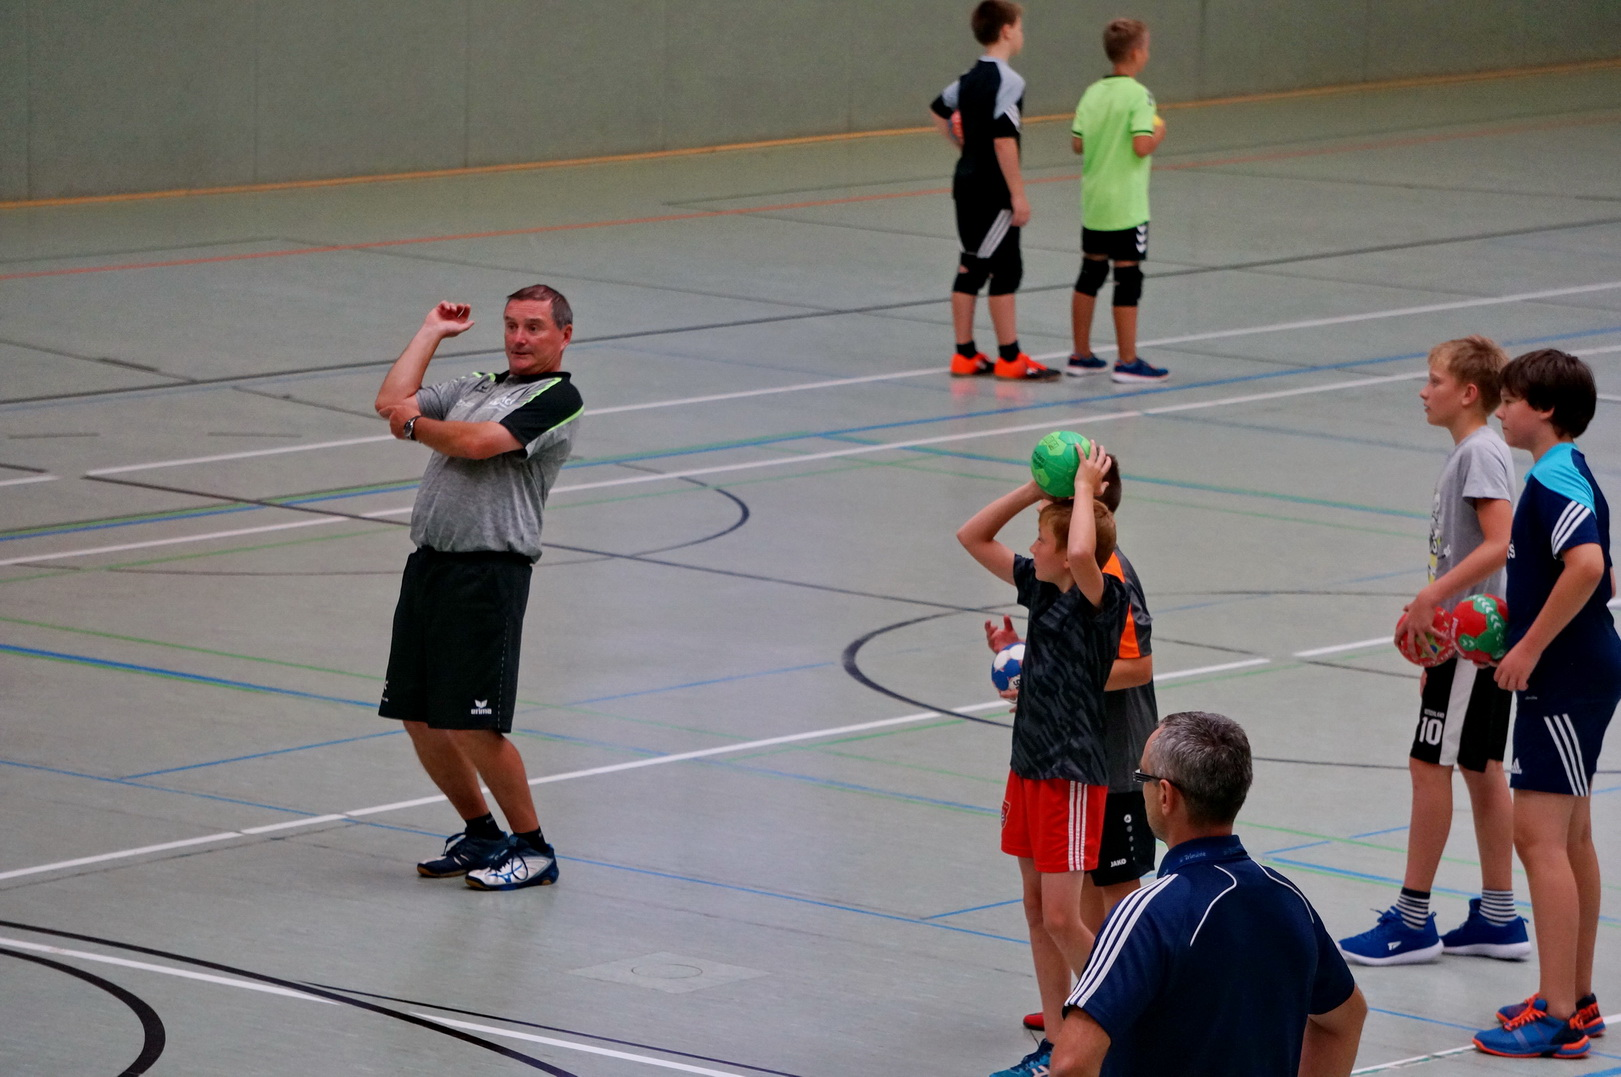 201808_Handballcamp_SDH_MG_093w